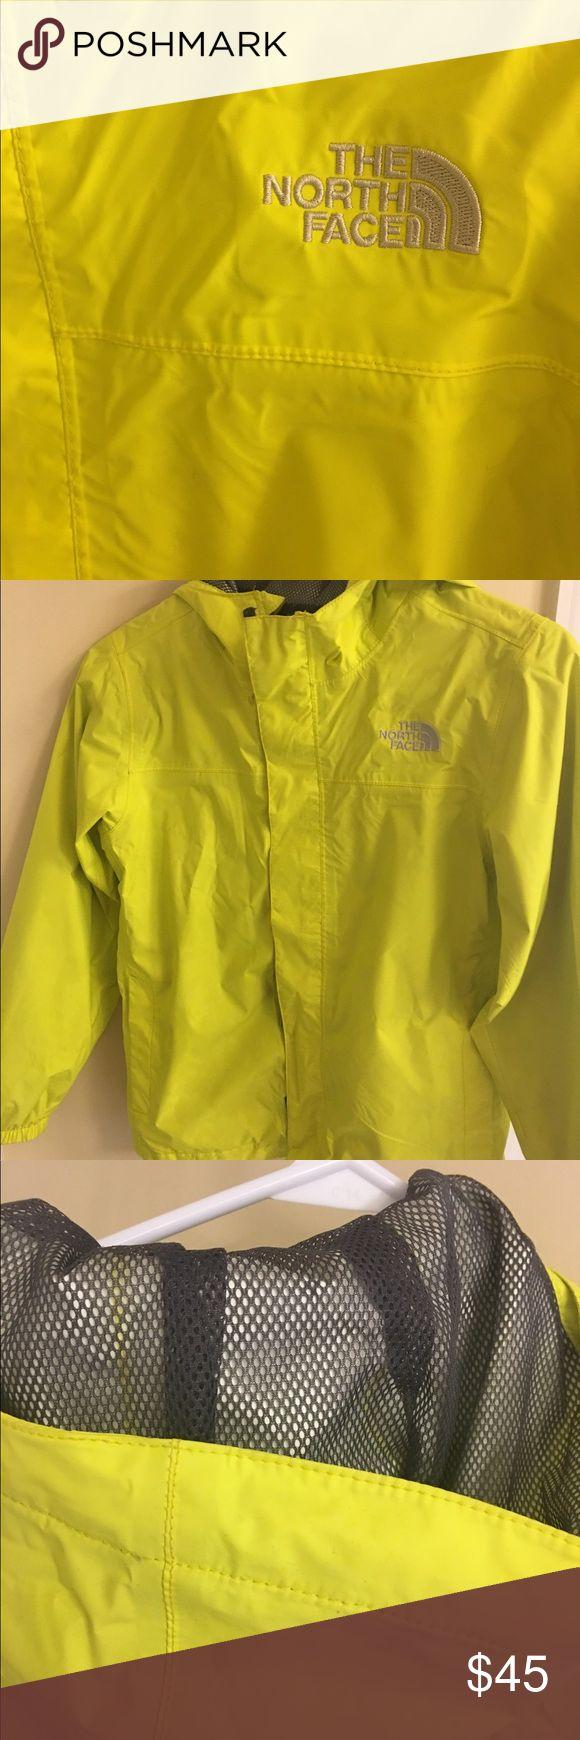 The North Face rain jacket. Boys/Girls north face rain jacket.  Bright YELLOW.  Size medium The North Face Jackets & Coats Raincoats